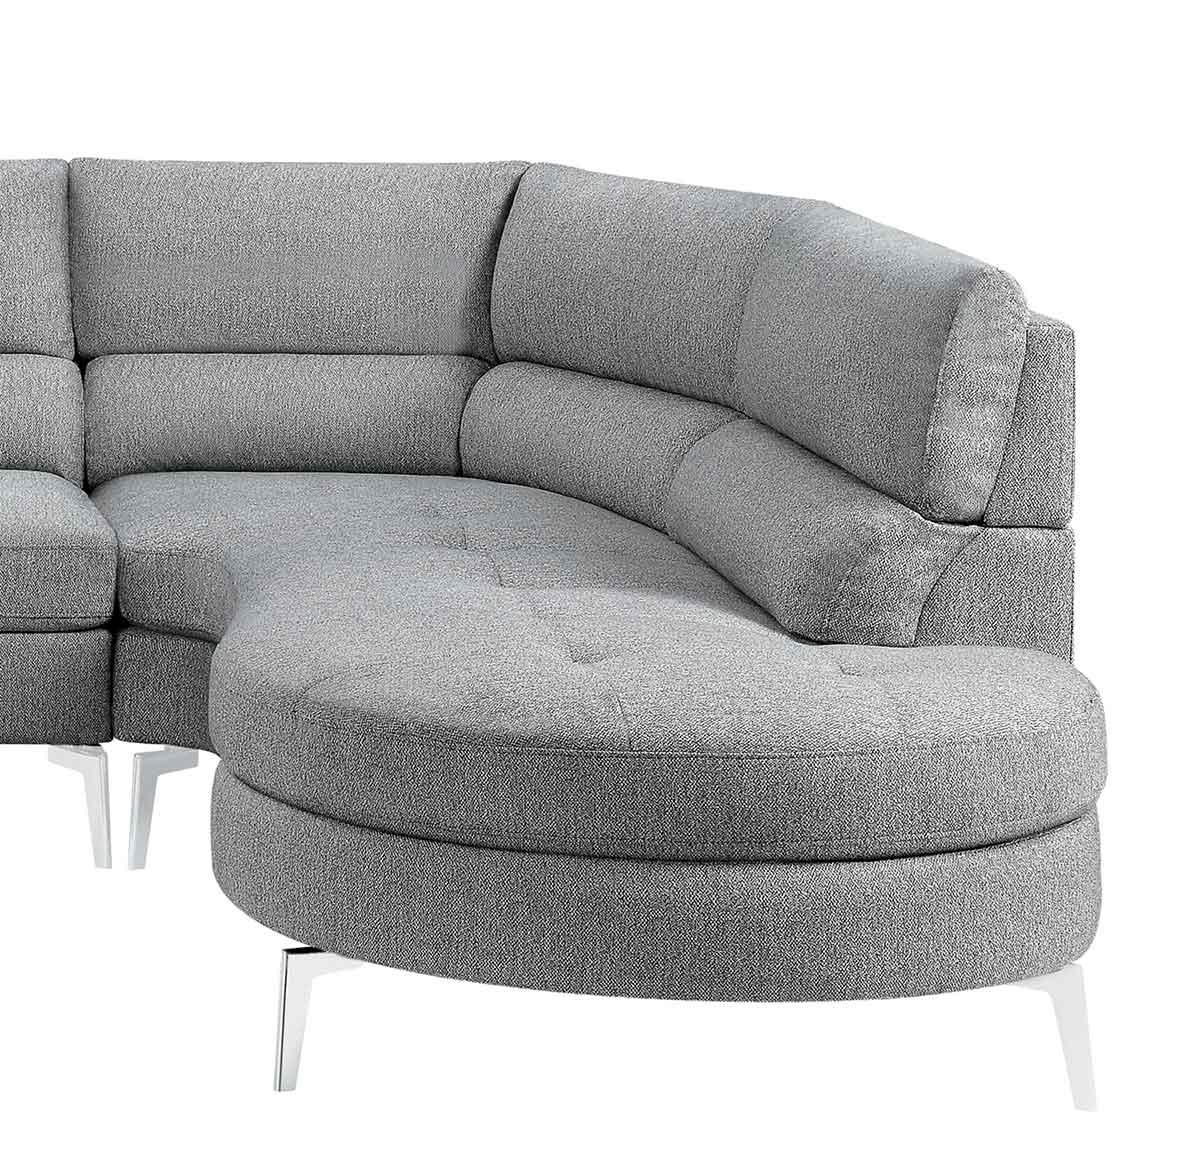 Homelegance Bonita Right Side Chaise - Gray